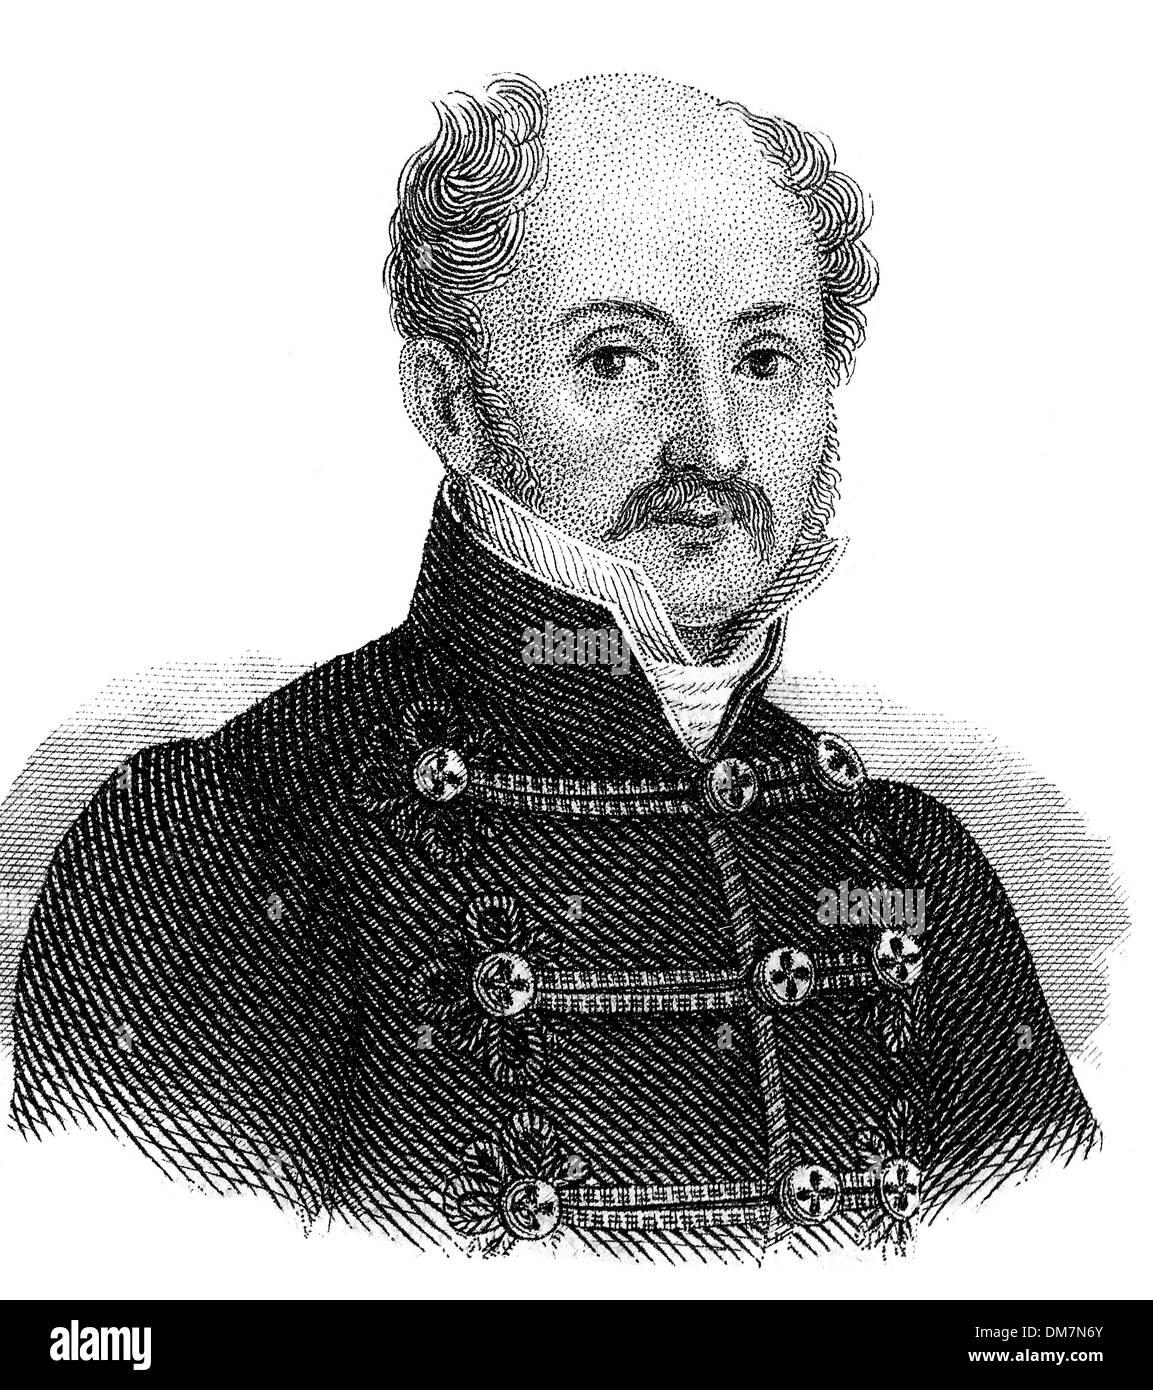 Sándor Kisfaludy, 1772 - 1844, Hungarian lyric poet, - Stock Image